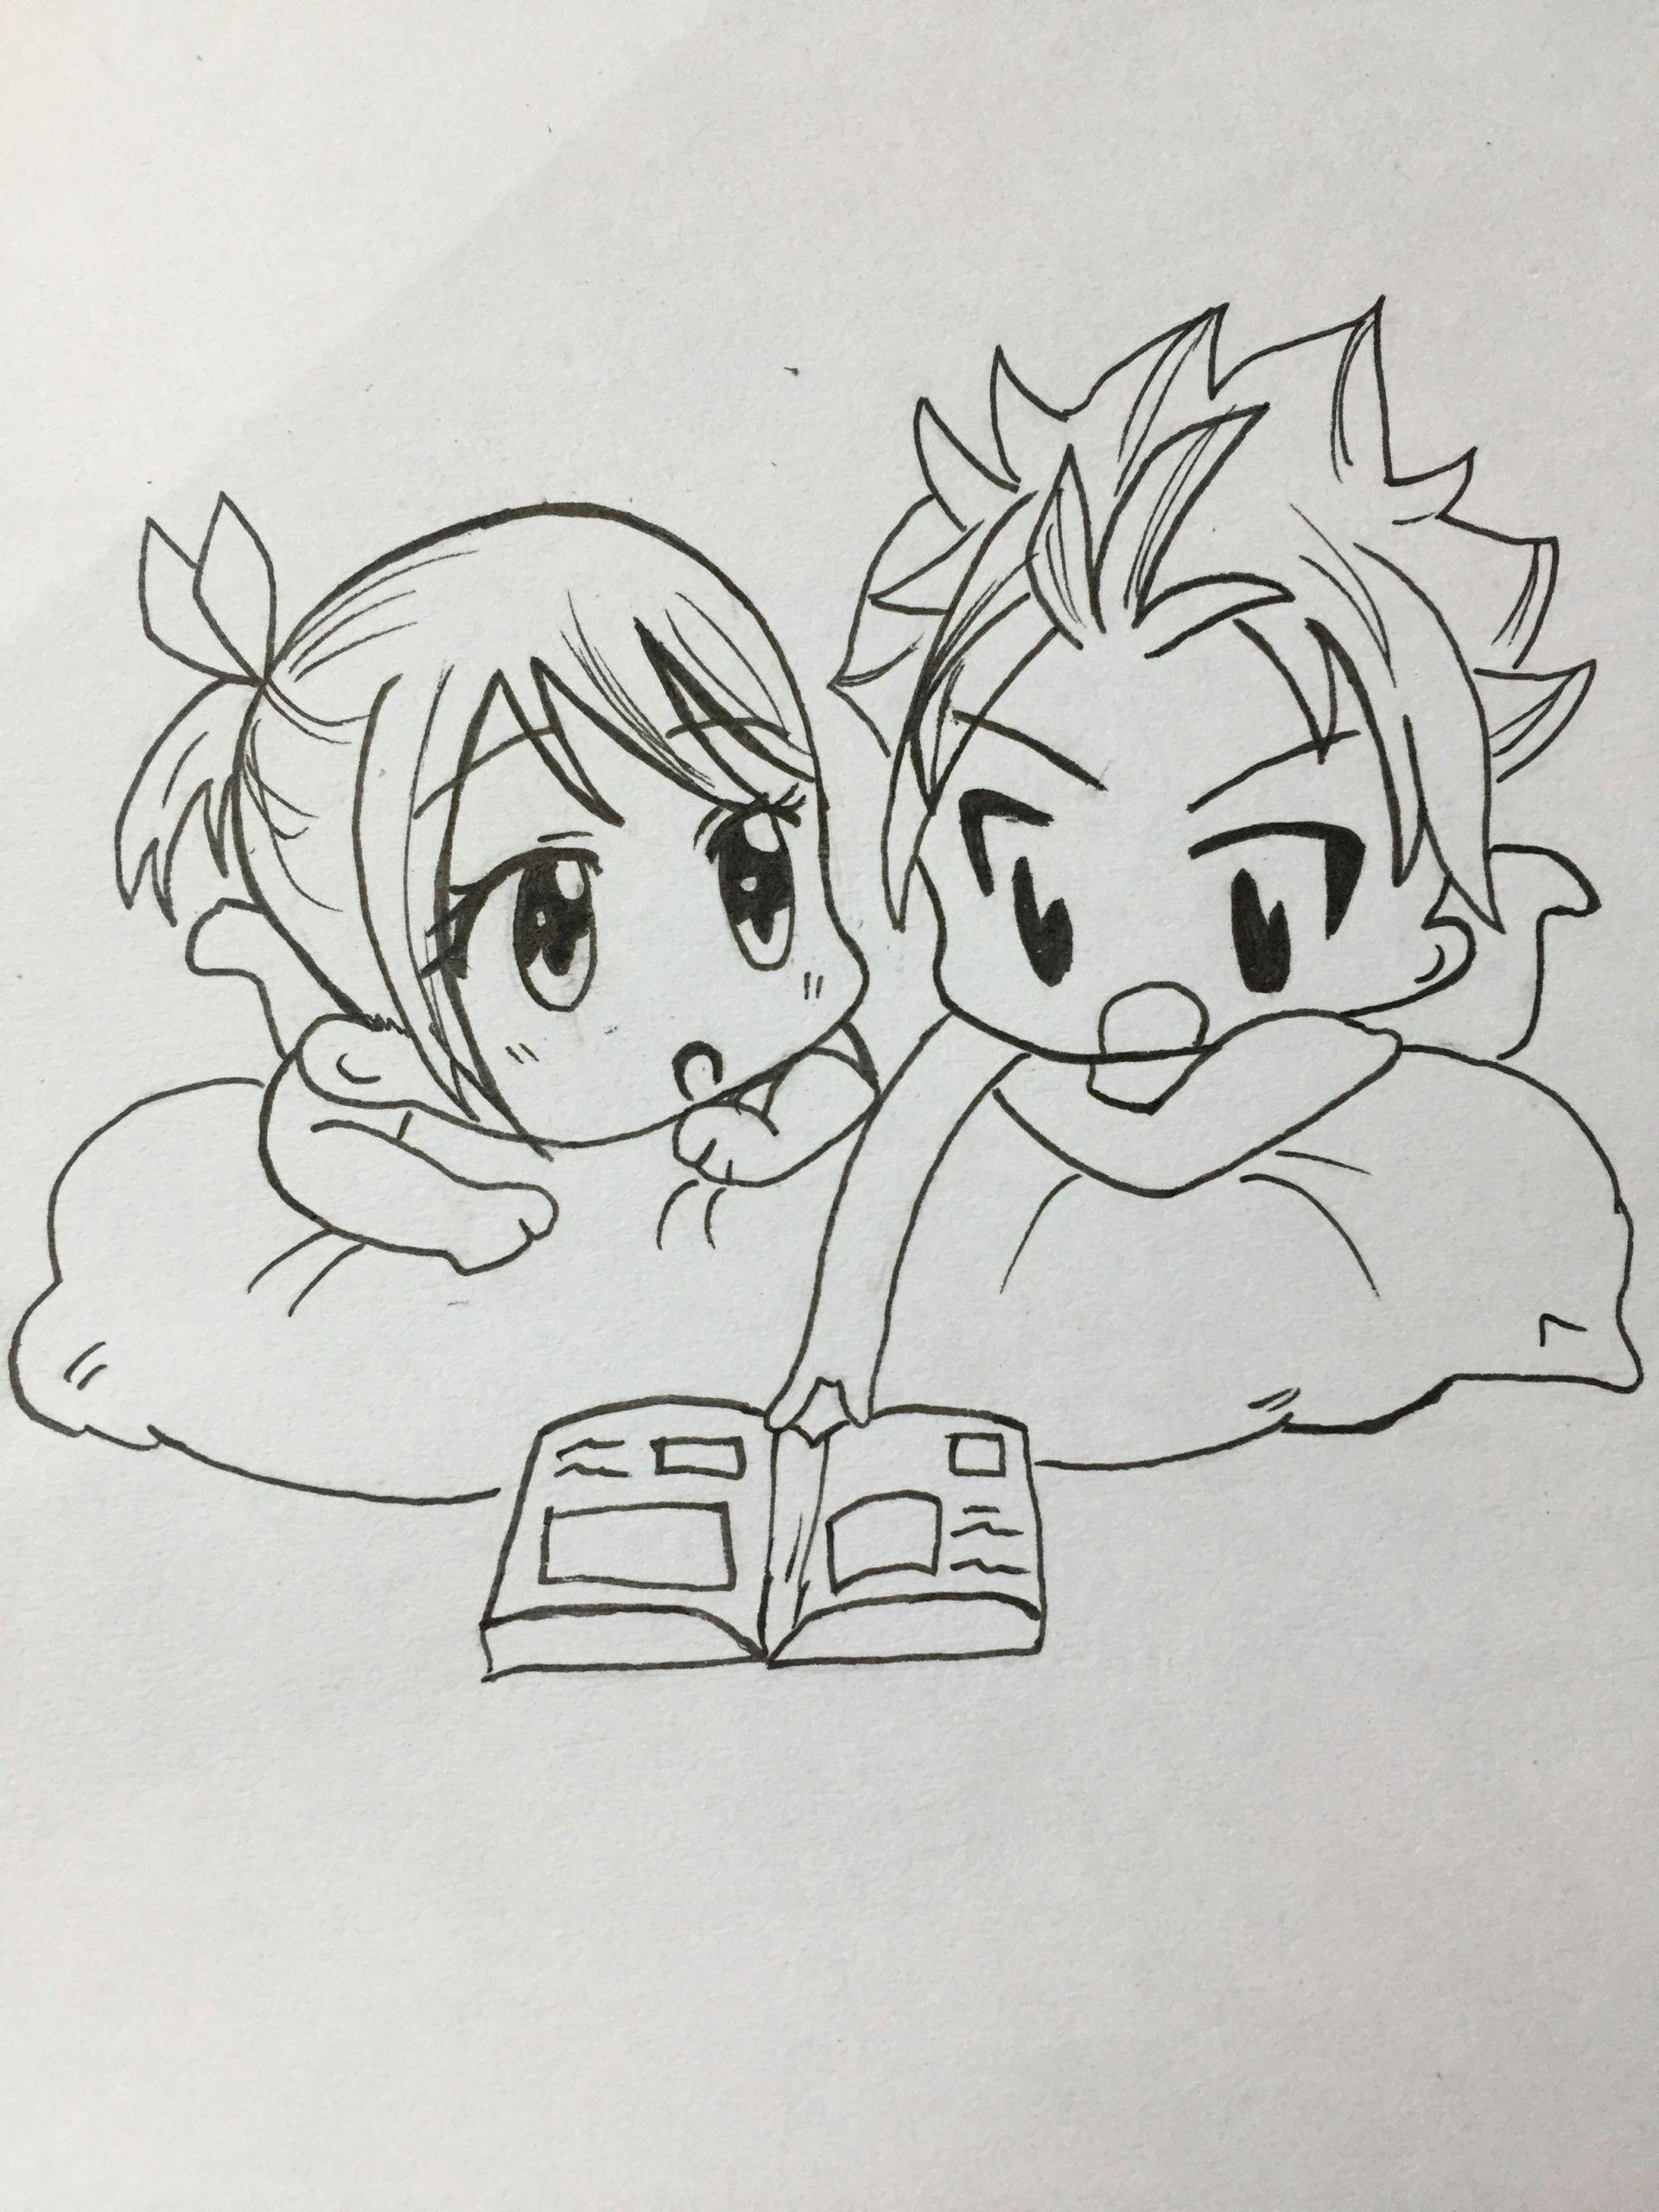 Anime Drawings Fairy Tail Nalu Chibi Fairytail Nalu Chibi Mangadrawing Manga